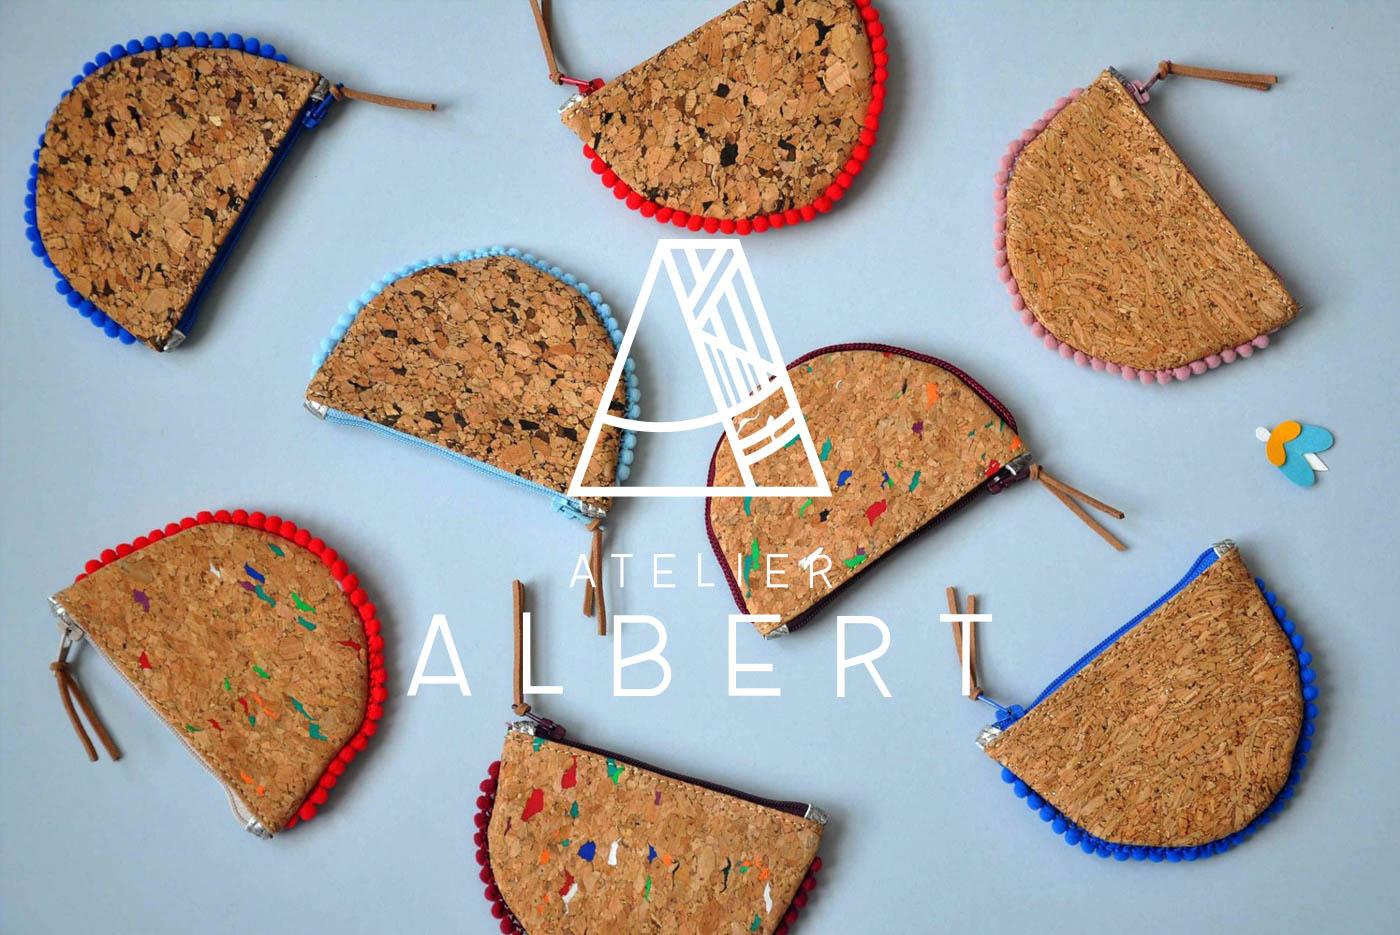 Ensemble de porte-monnaie de l'Atelier Albert avec son logo en blanc